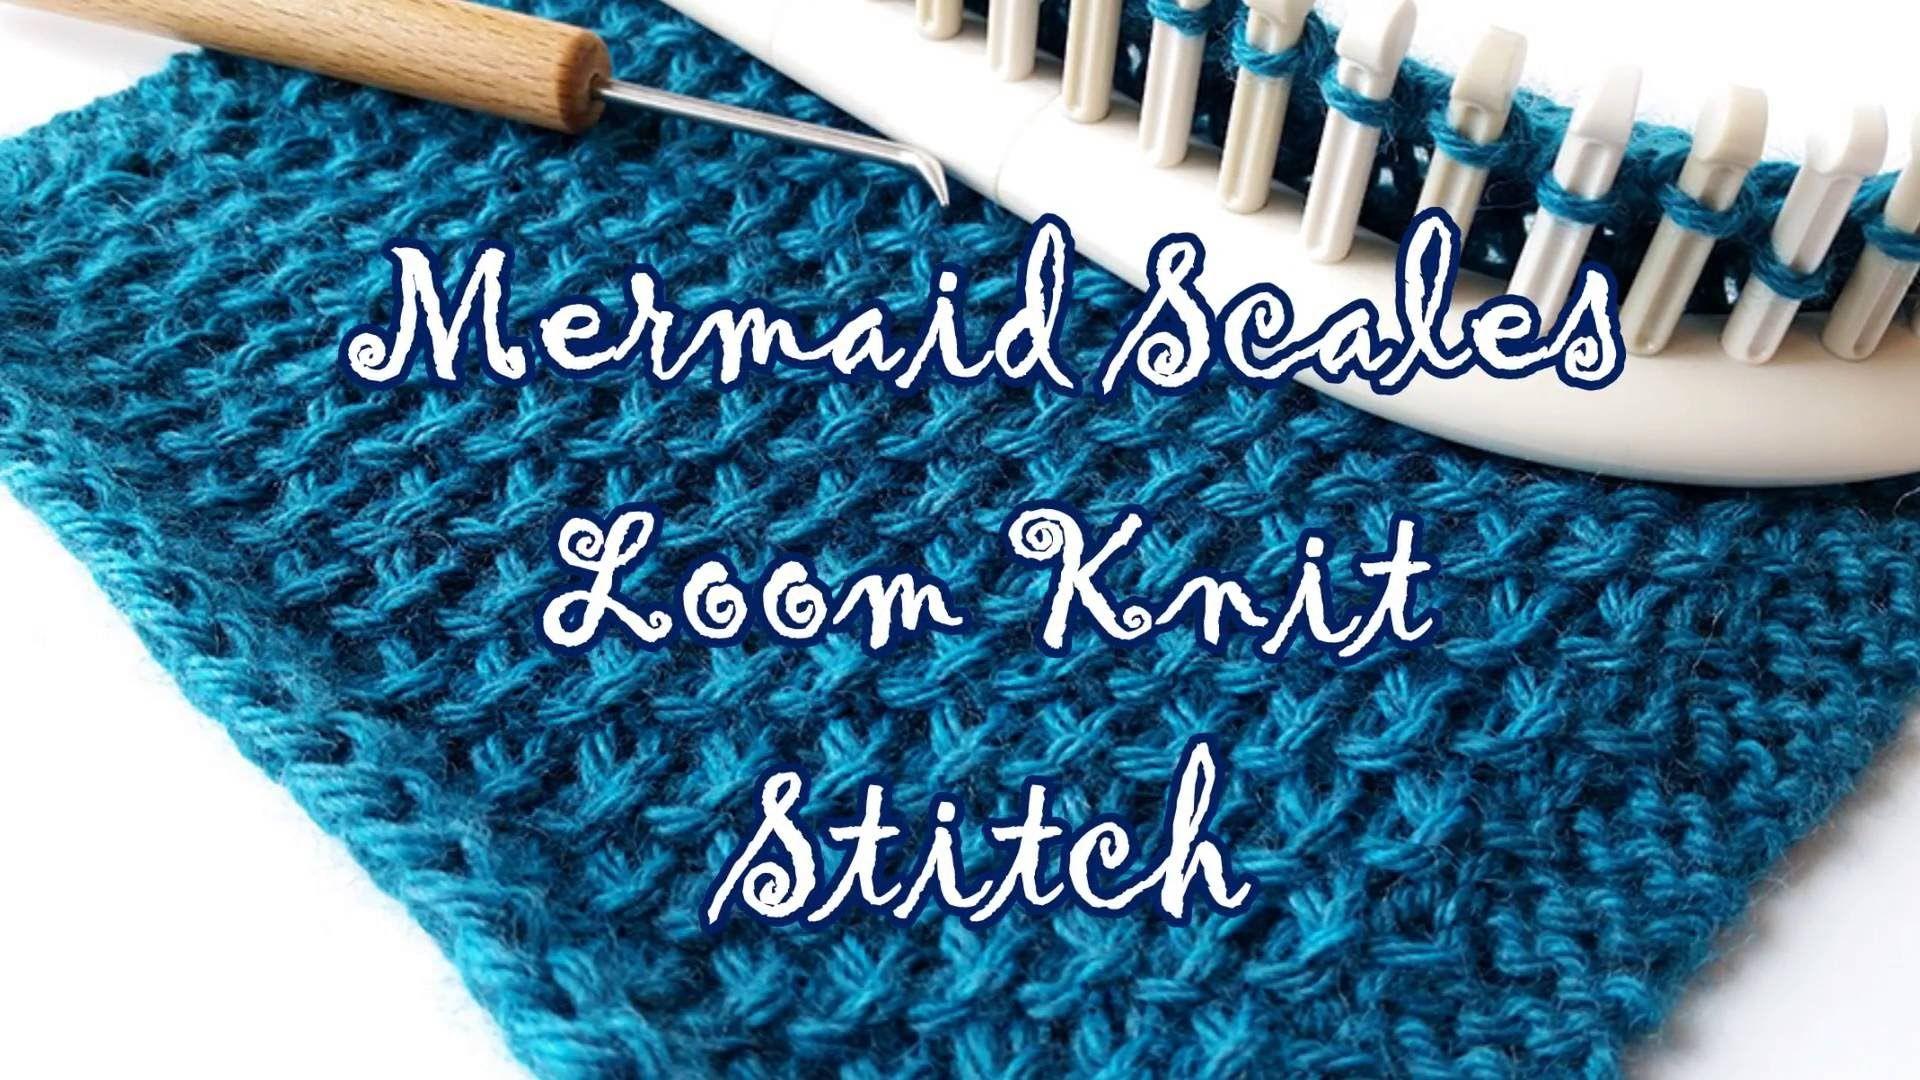 Loom Knitting Stitch: Mermaid Scales! - YouTube   Loom knitting ...